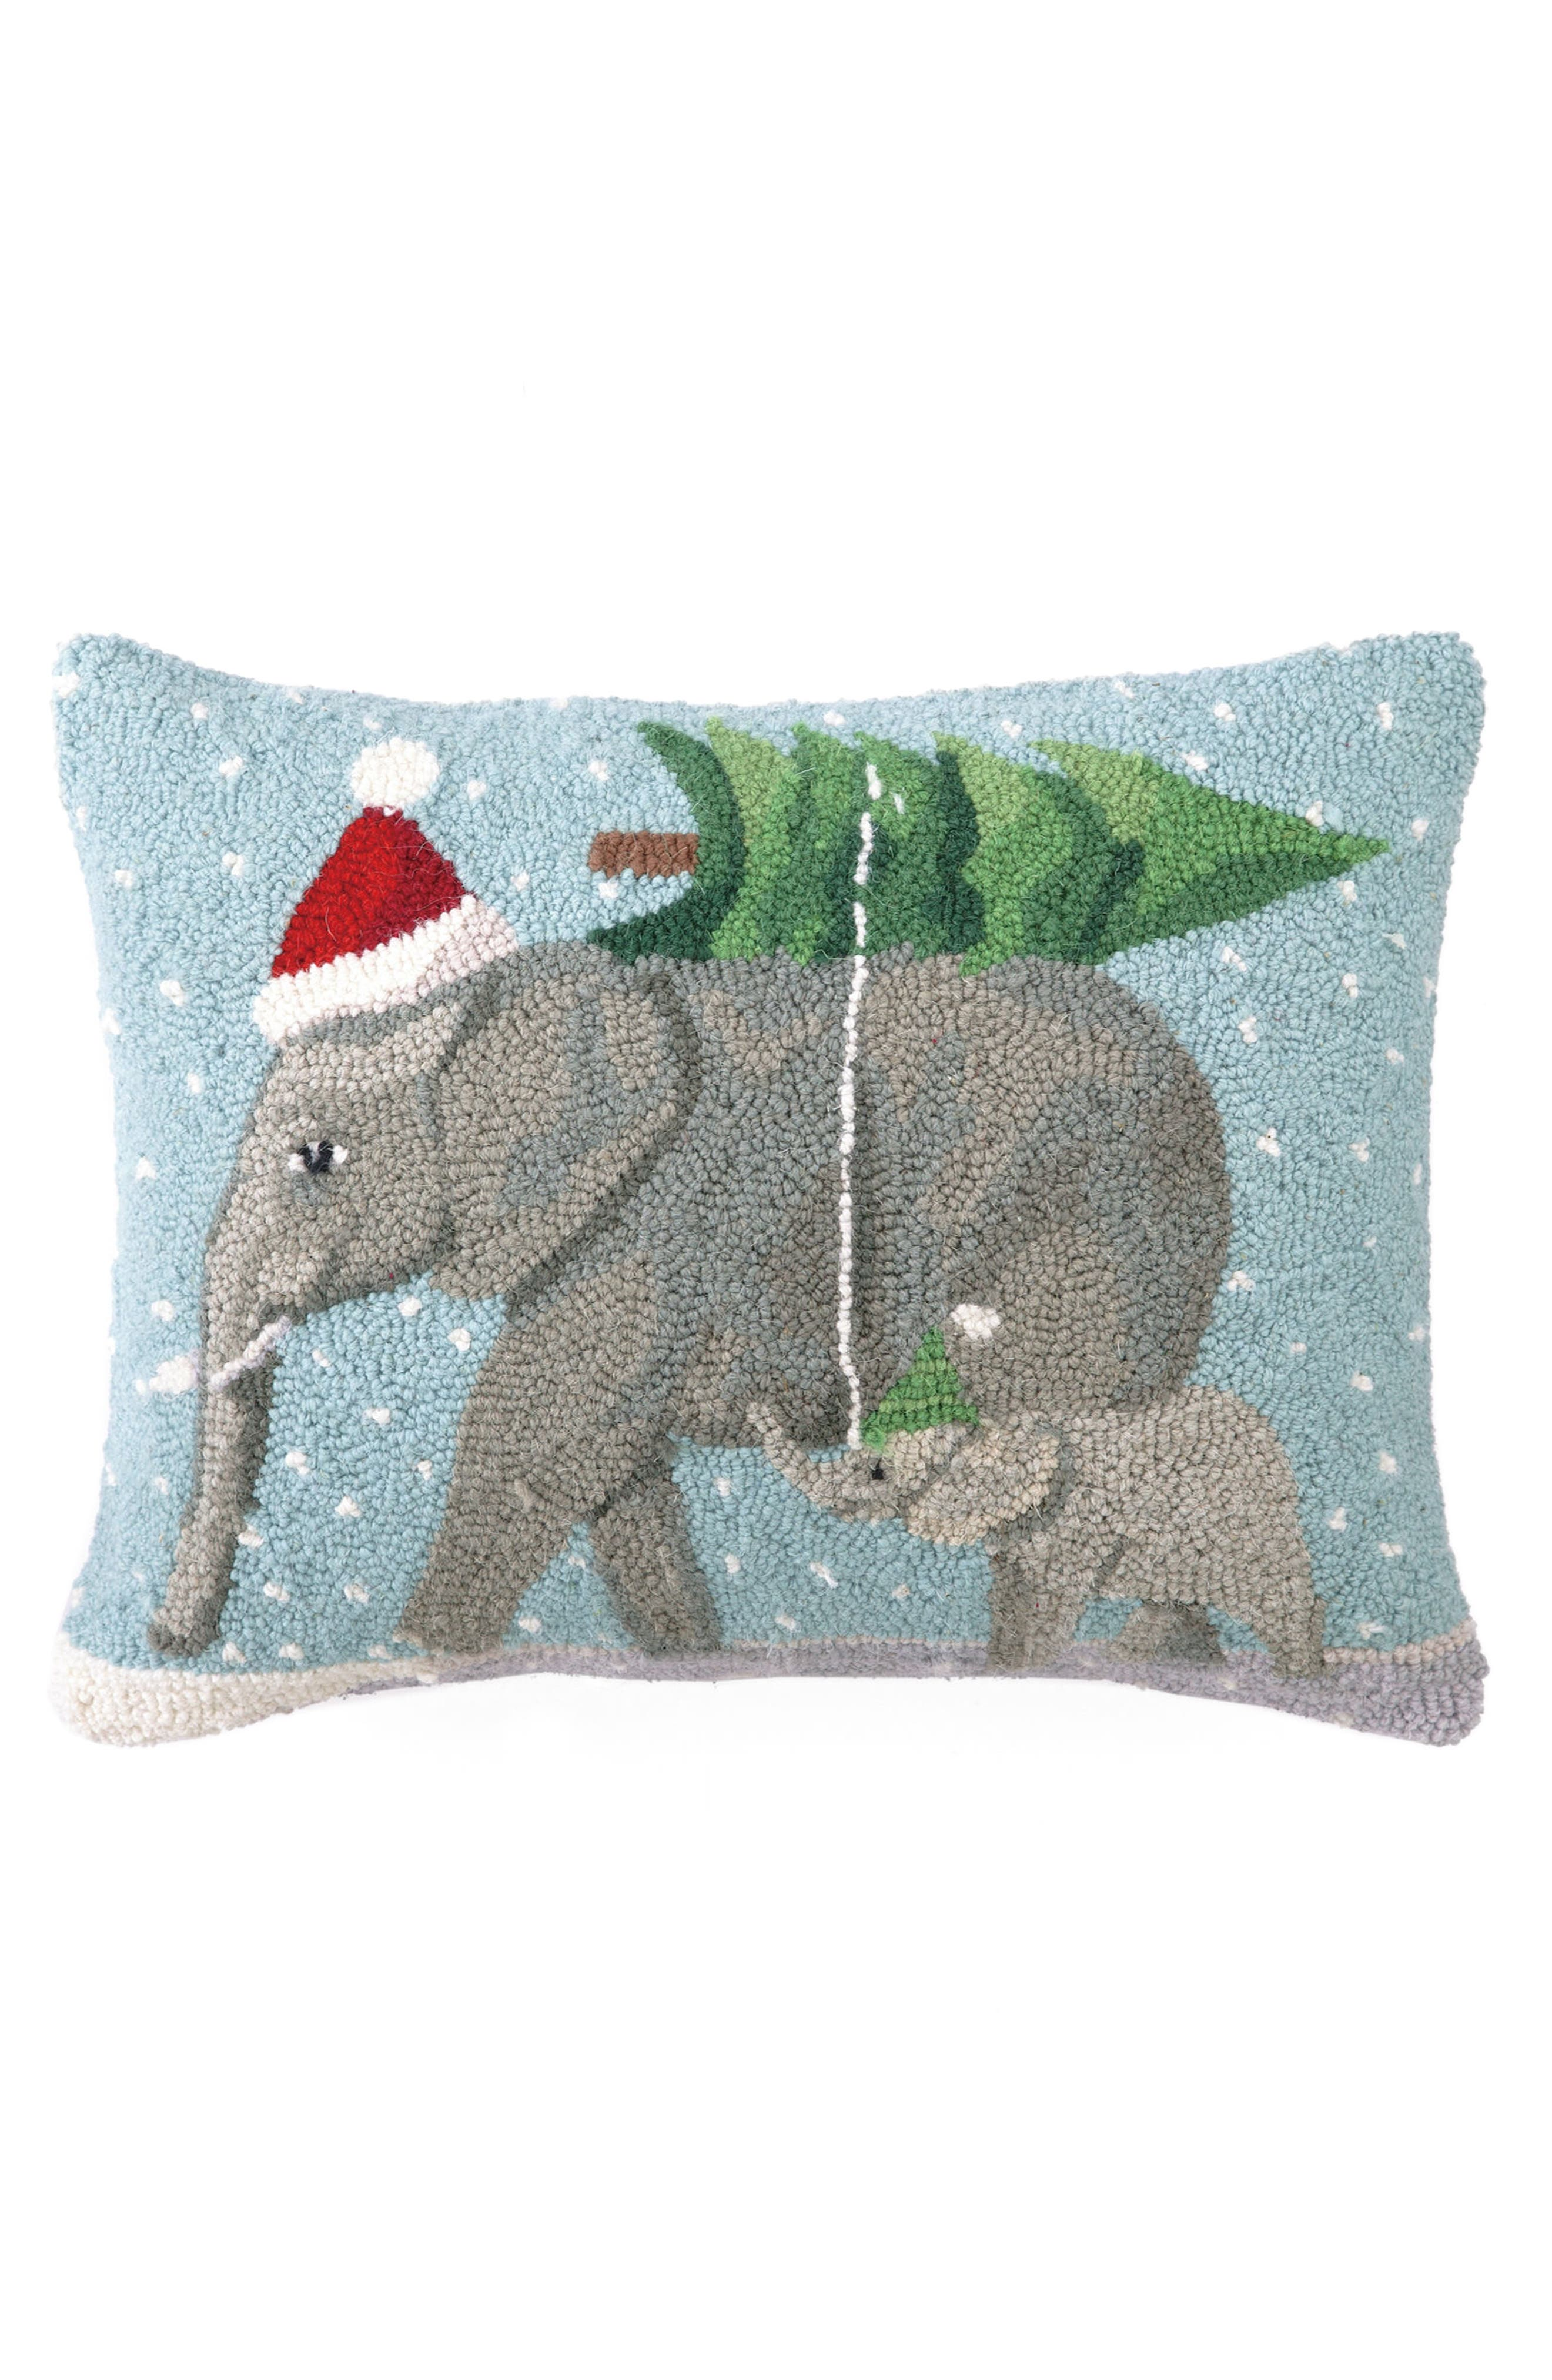 Peking Handicraft Christmas Elephants Hooked Accent Pillow